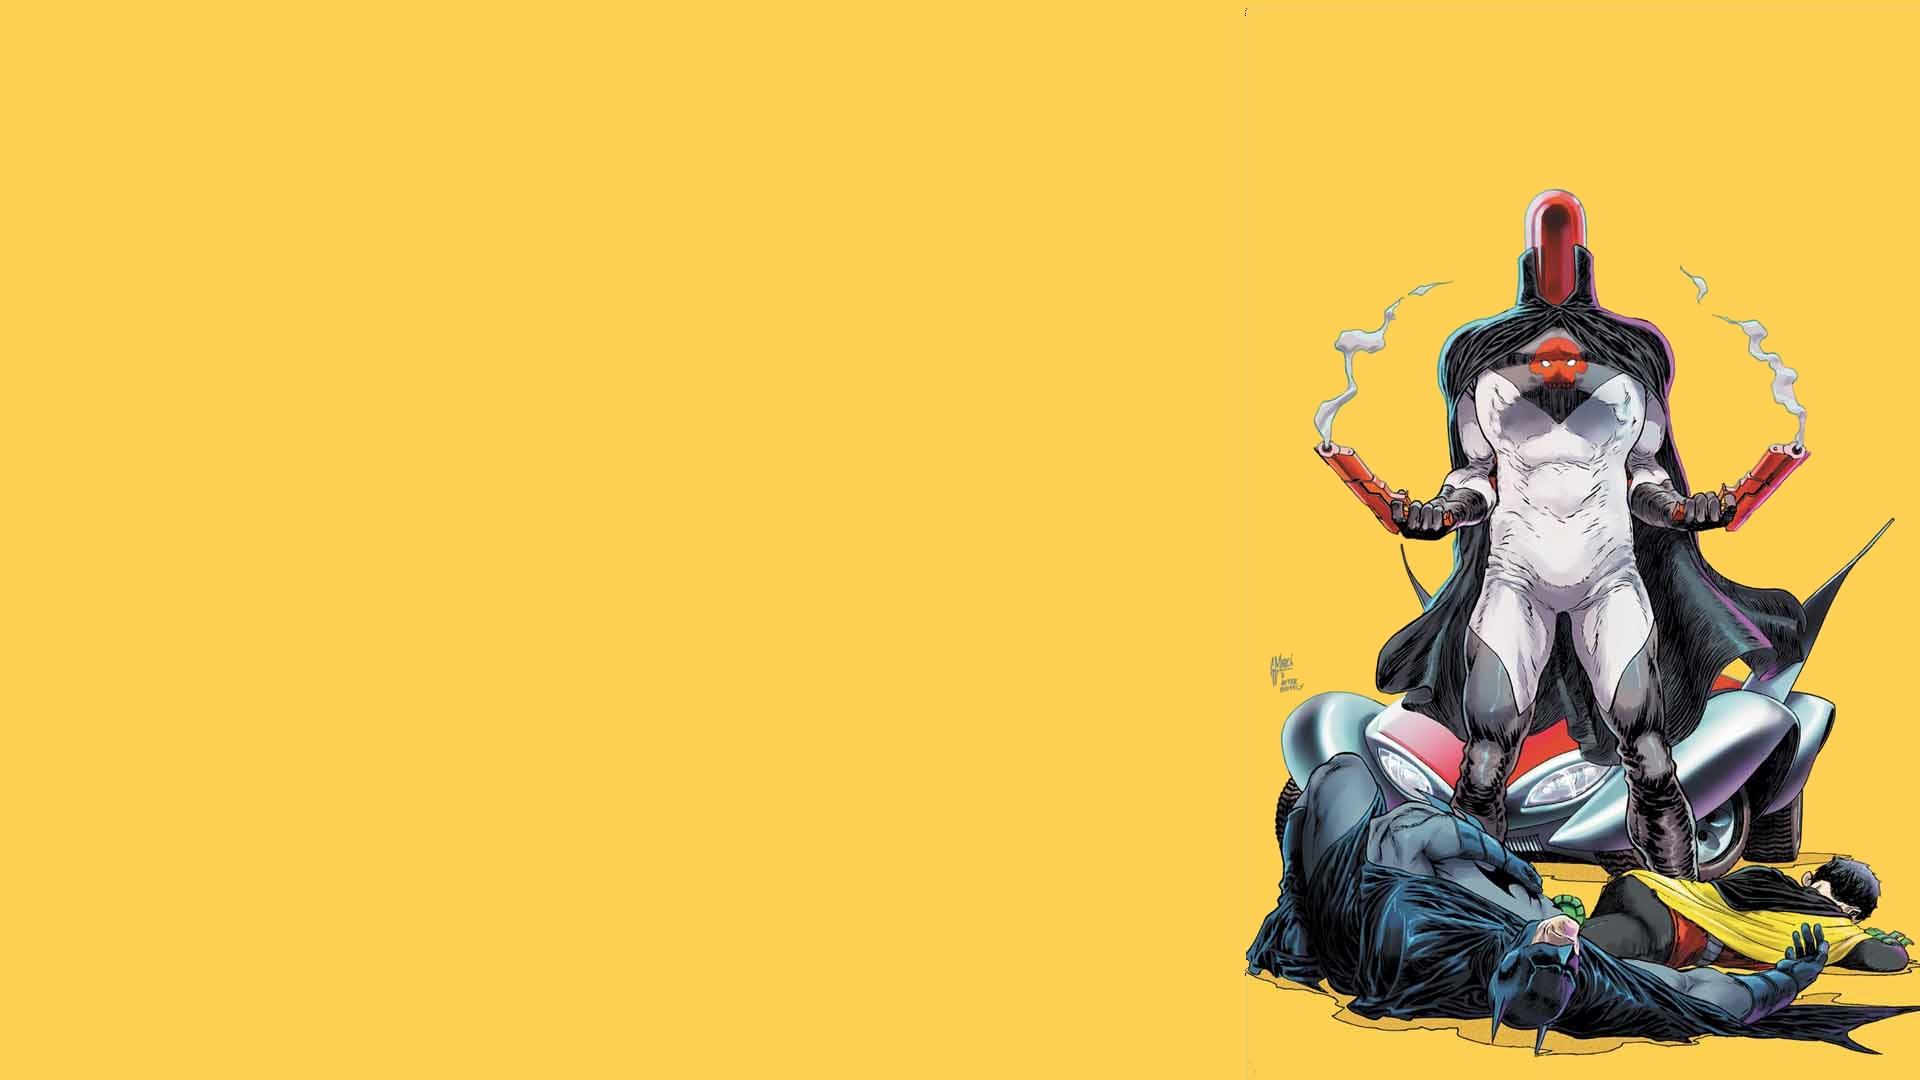 batman robin wallpaper 1433x897 - photo #15